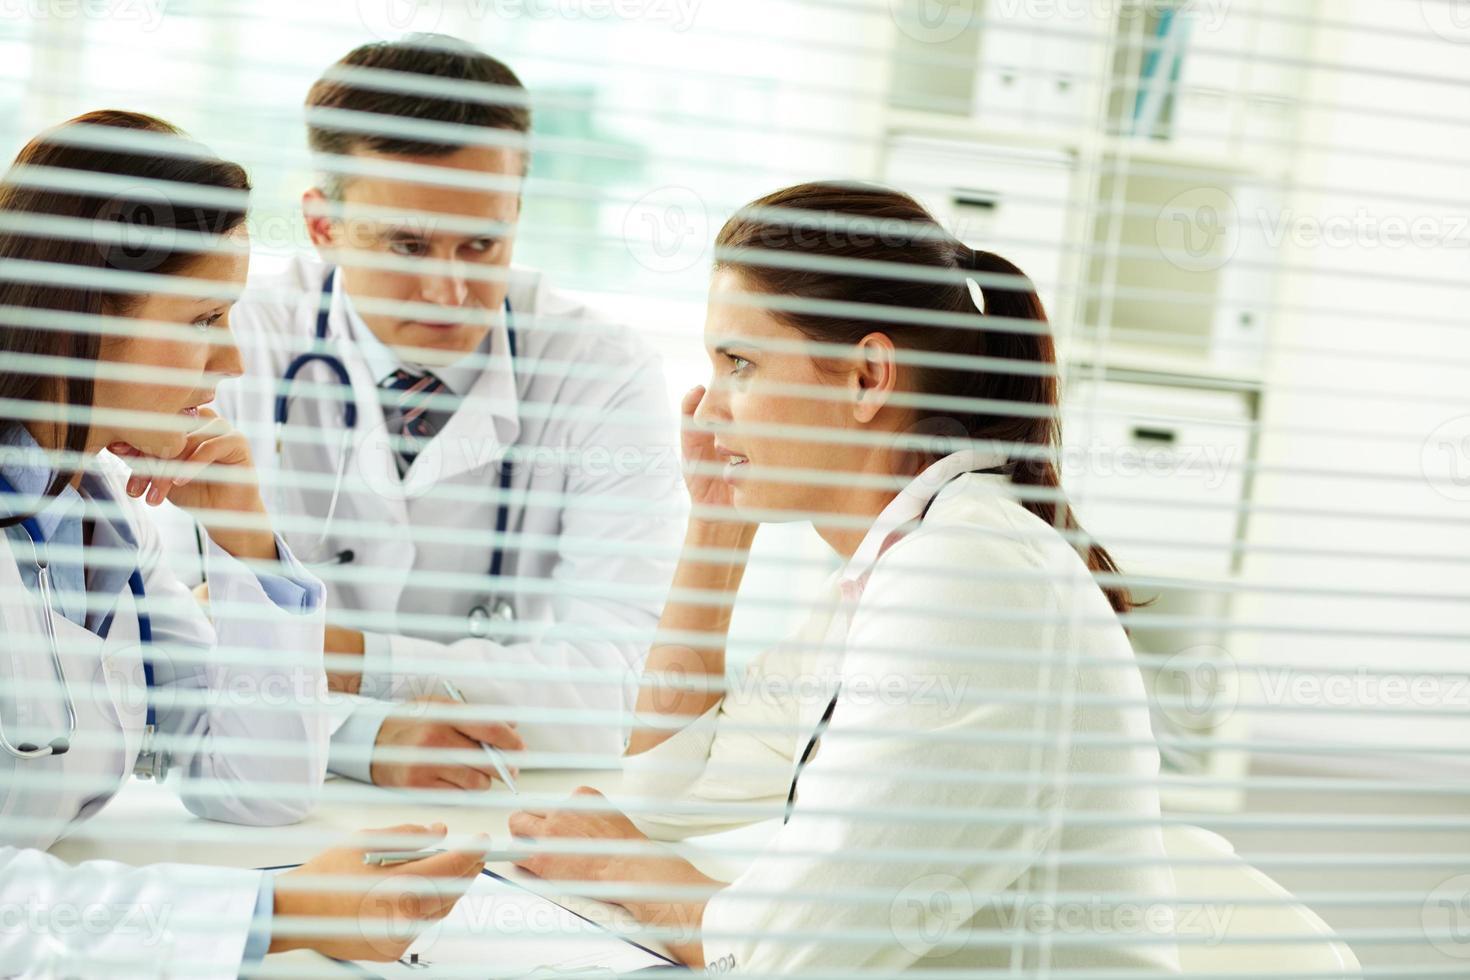 Medical consultation photo